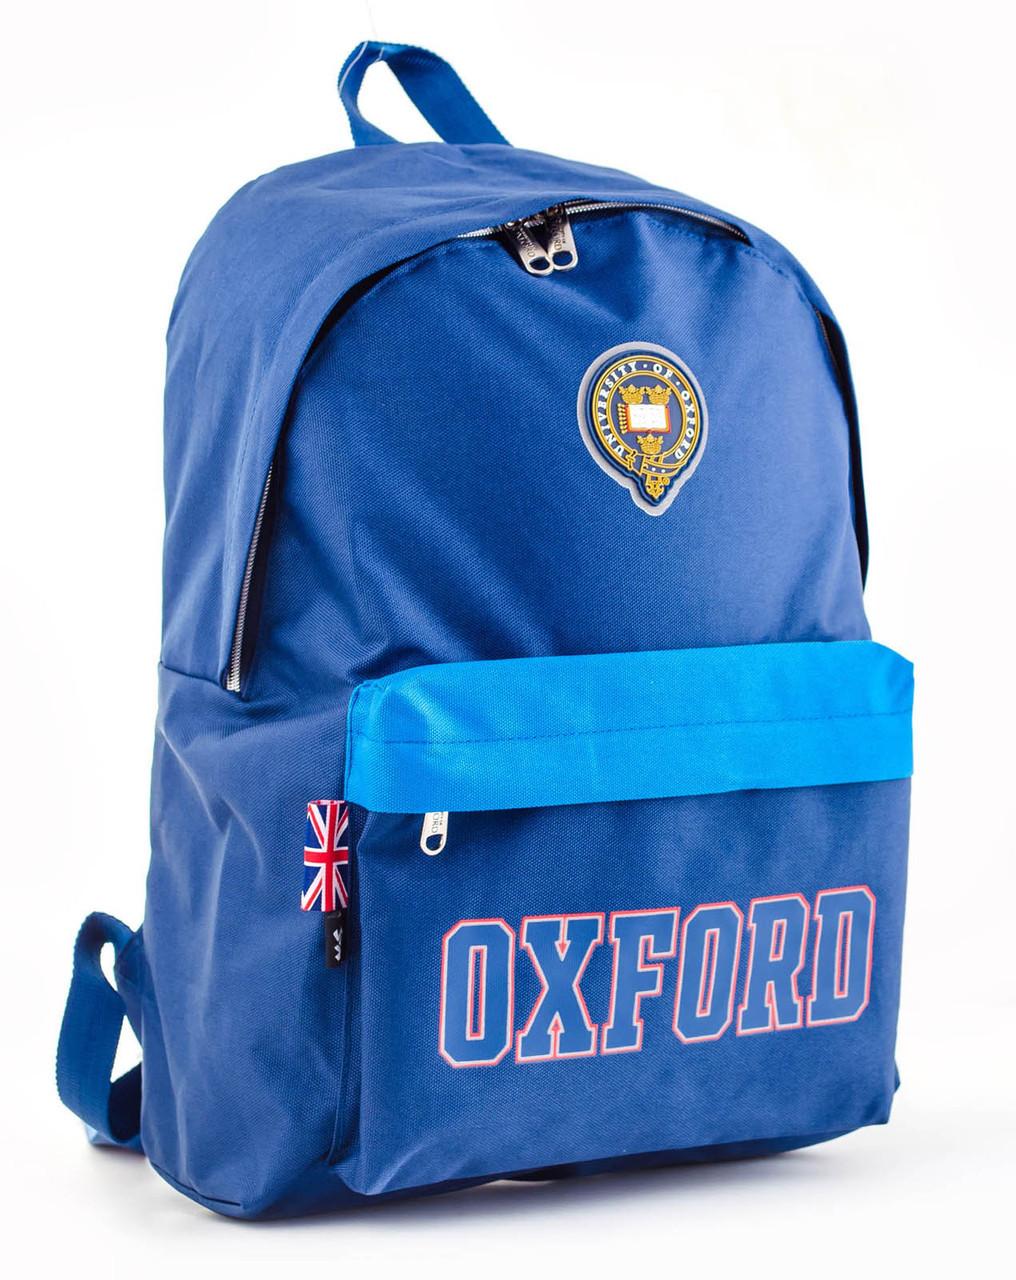 Рюкзак подростковый Yes OX-15 Oxford 553468